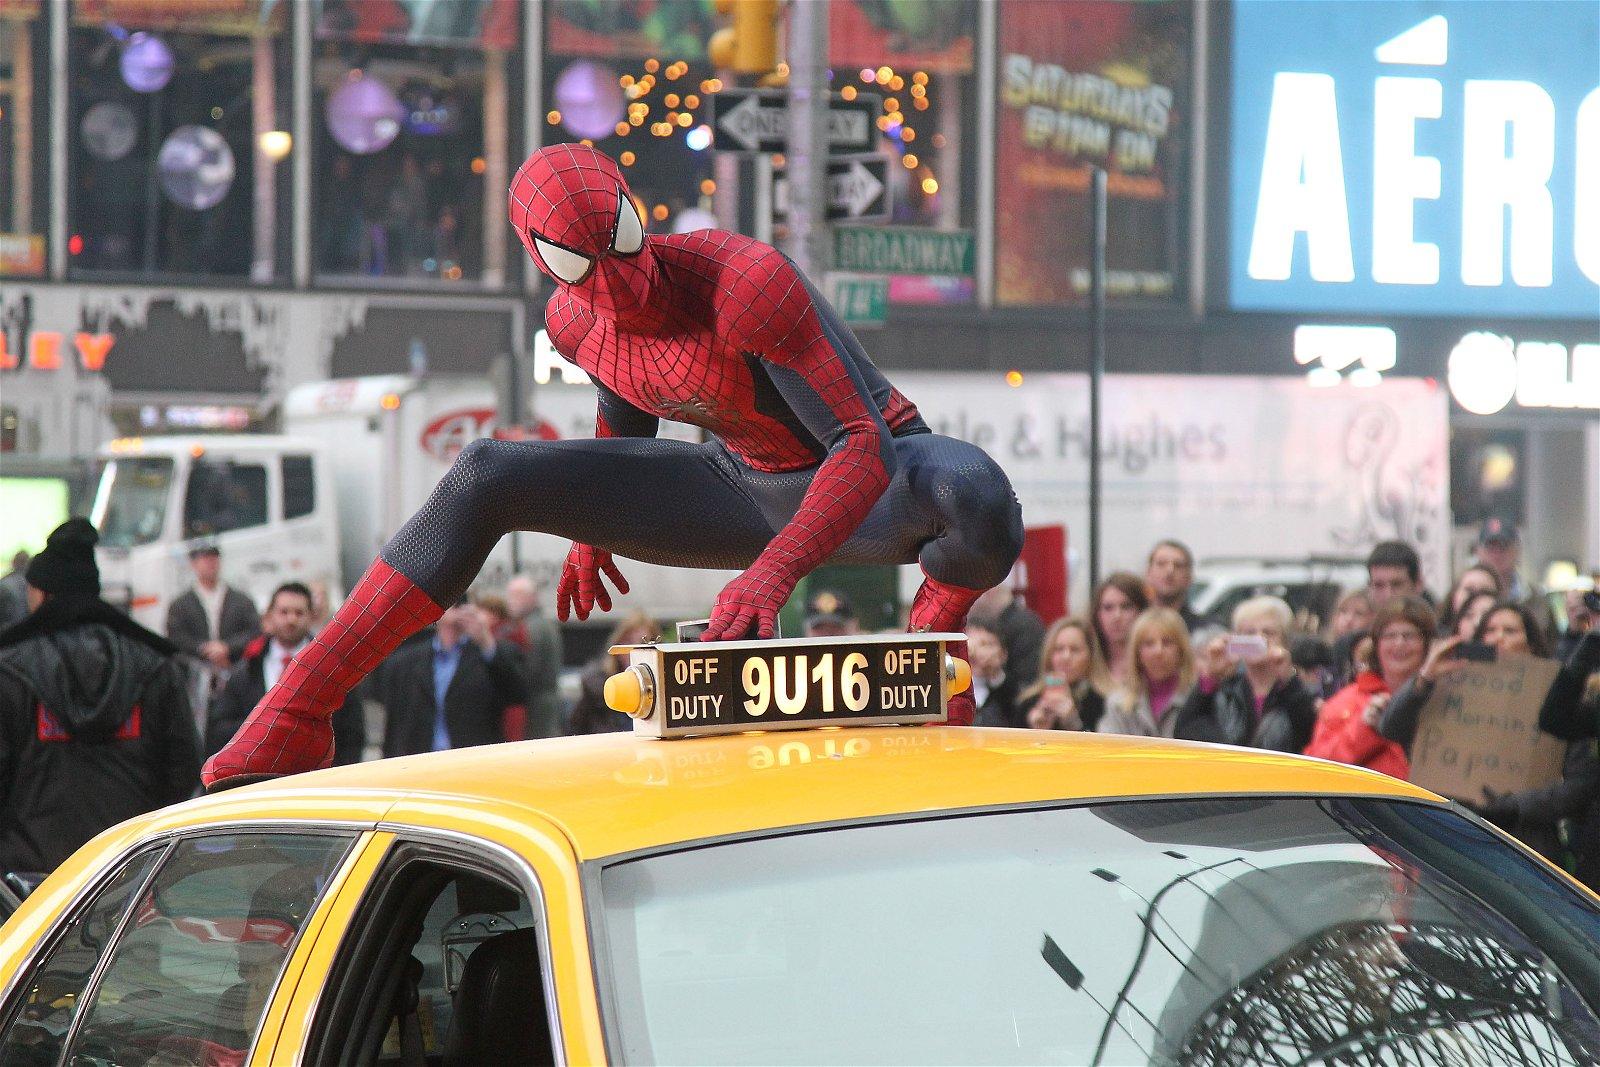 Spider-Man At Gma